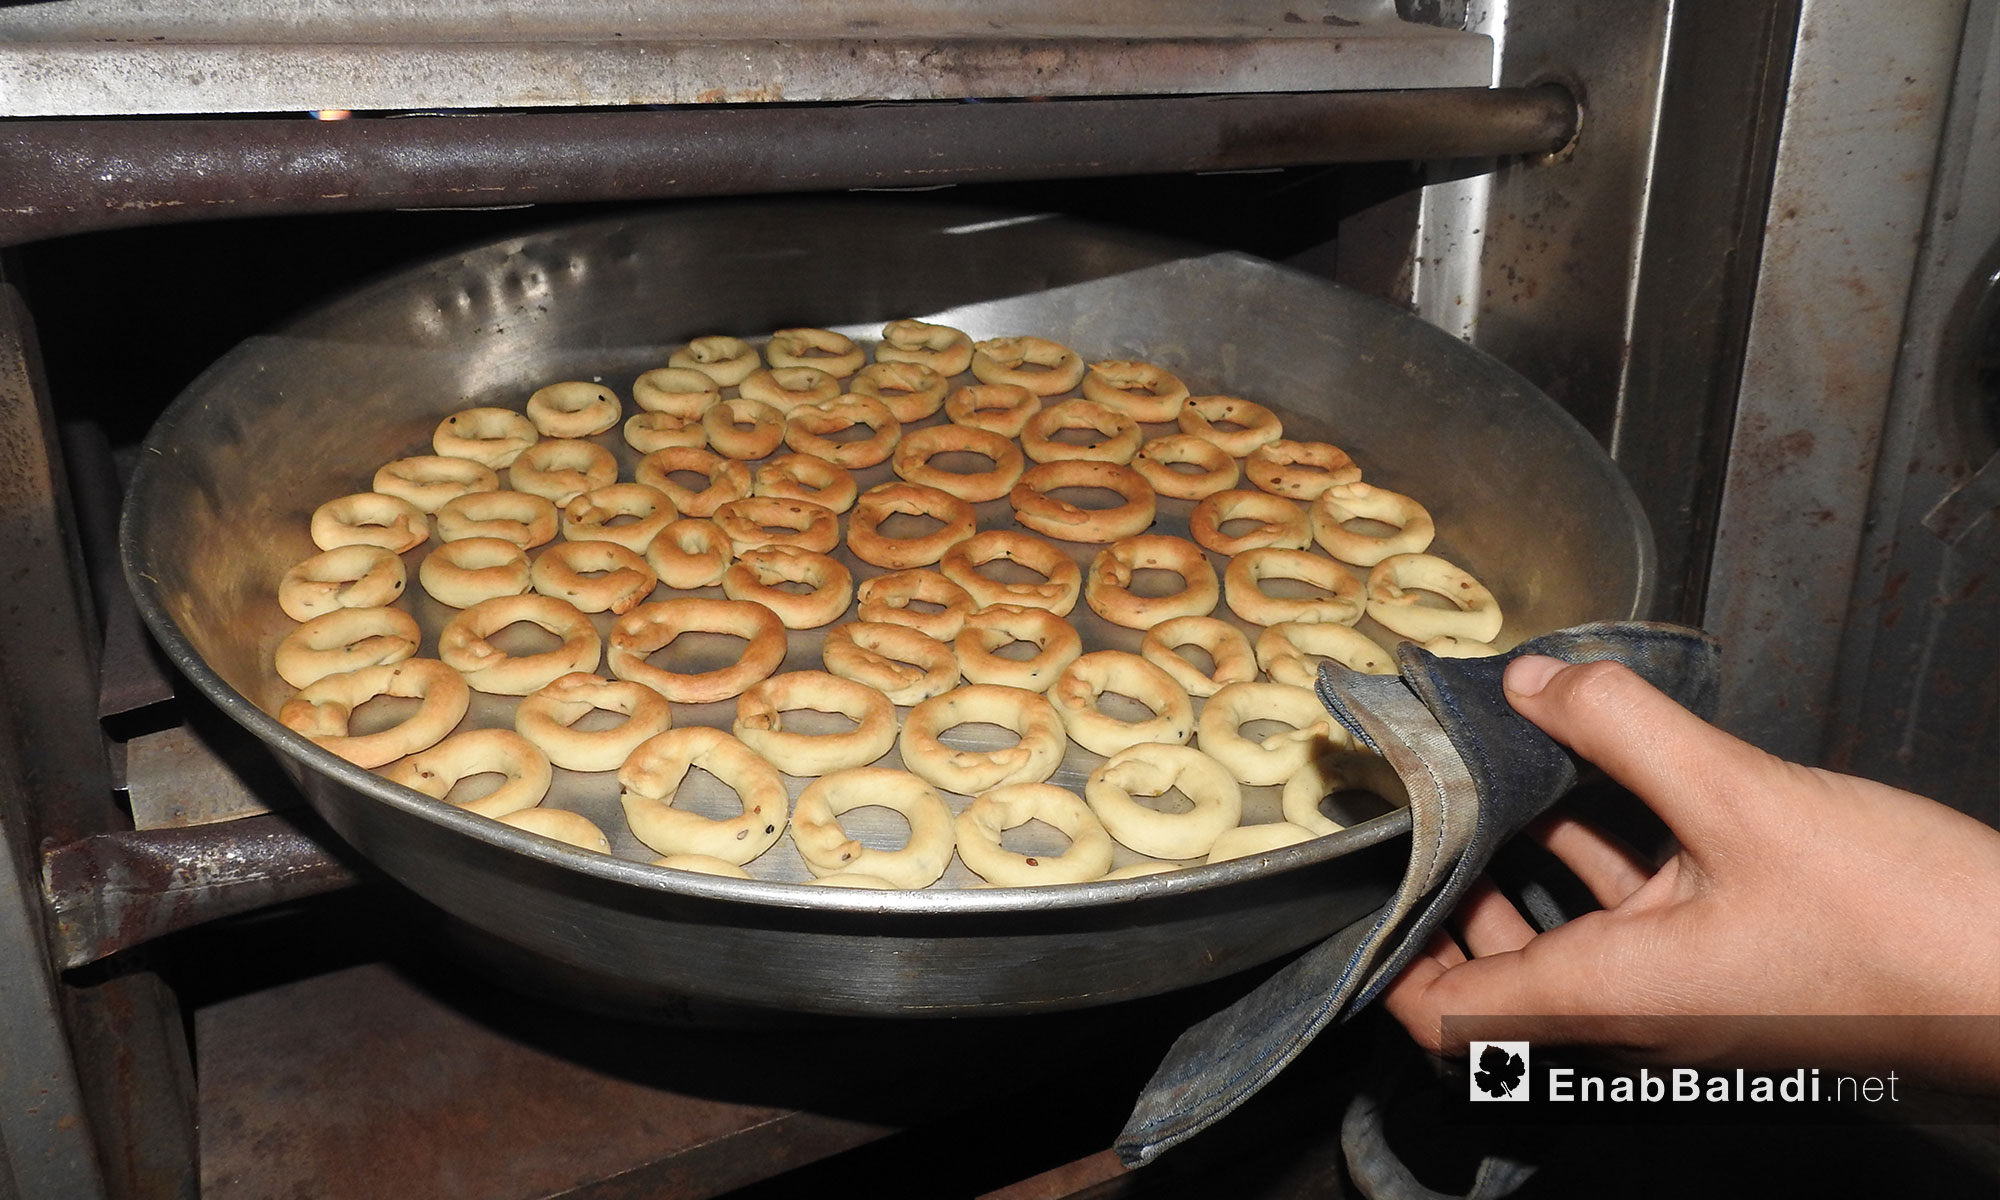 Homemade Eid sweets in Northern Aleppo – June 9, 2018 (Enab Baladi)